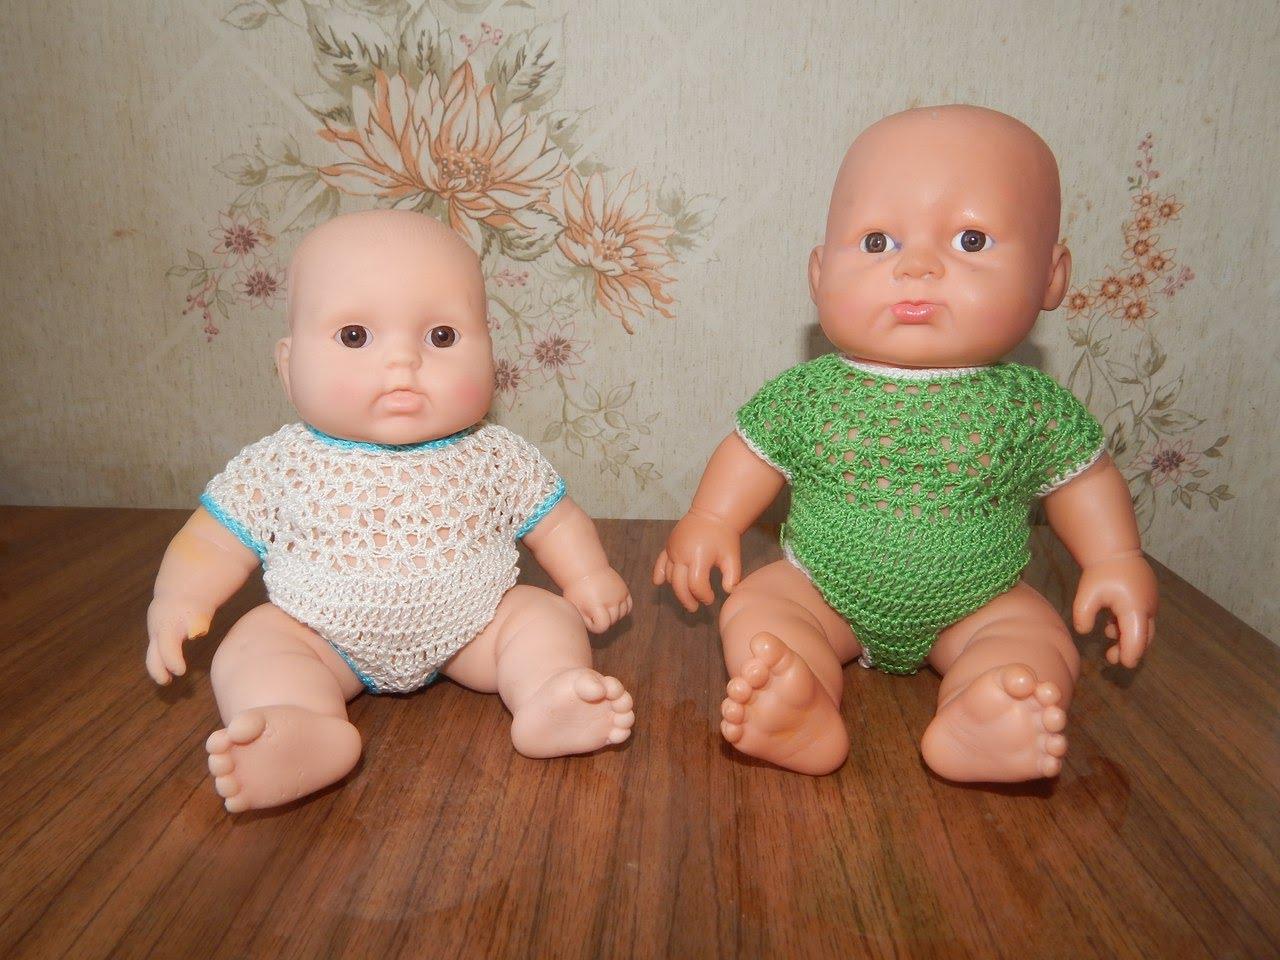 Як зробити одяг для ляльки своїми руками - штани bffc19d7da485